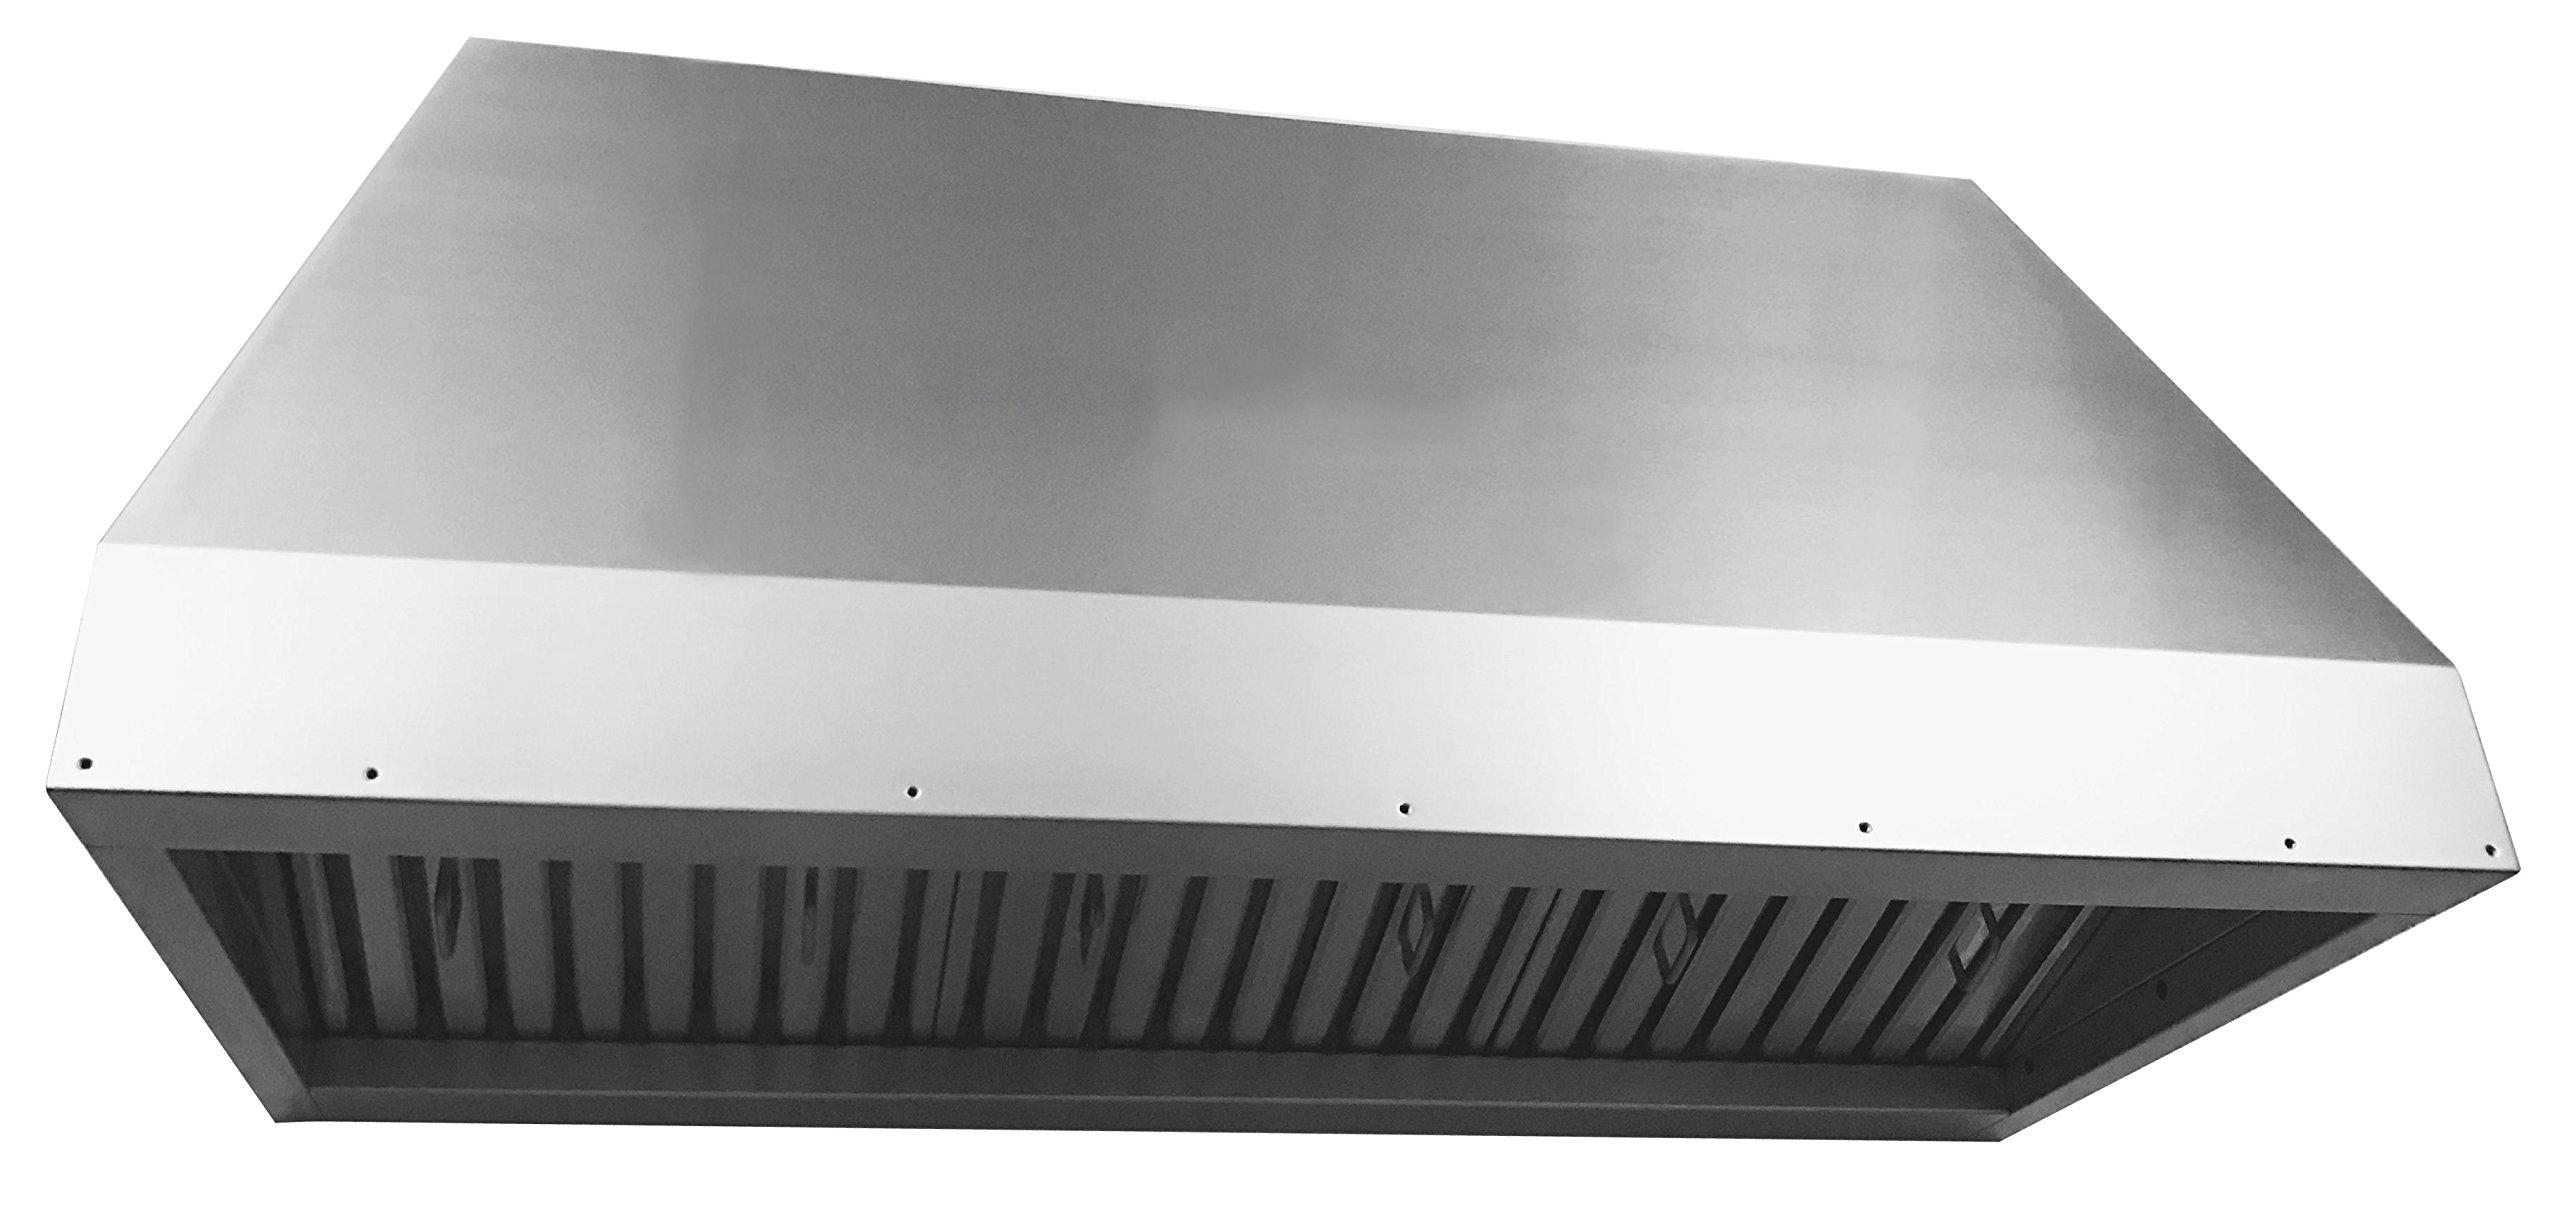 Cycene 40 Inch Professional Series Insert Liner Stainless Steel Range Hood w/ Baffle Filter @ 1000CFM - CY-RH19ILPS-40